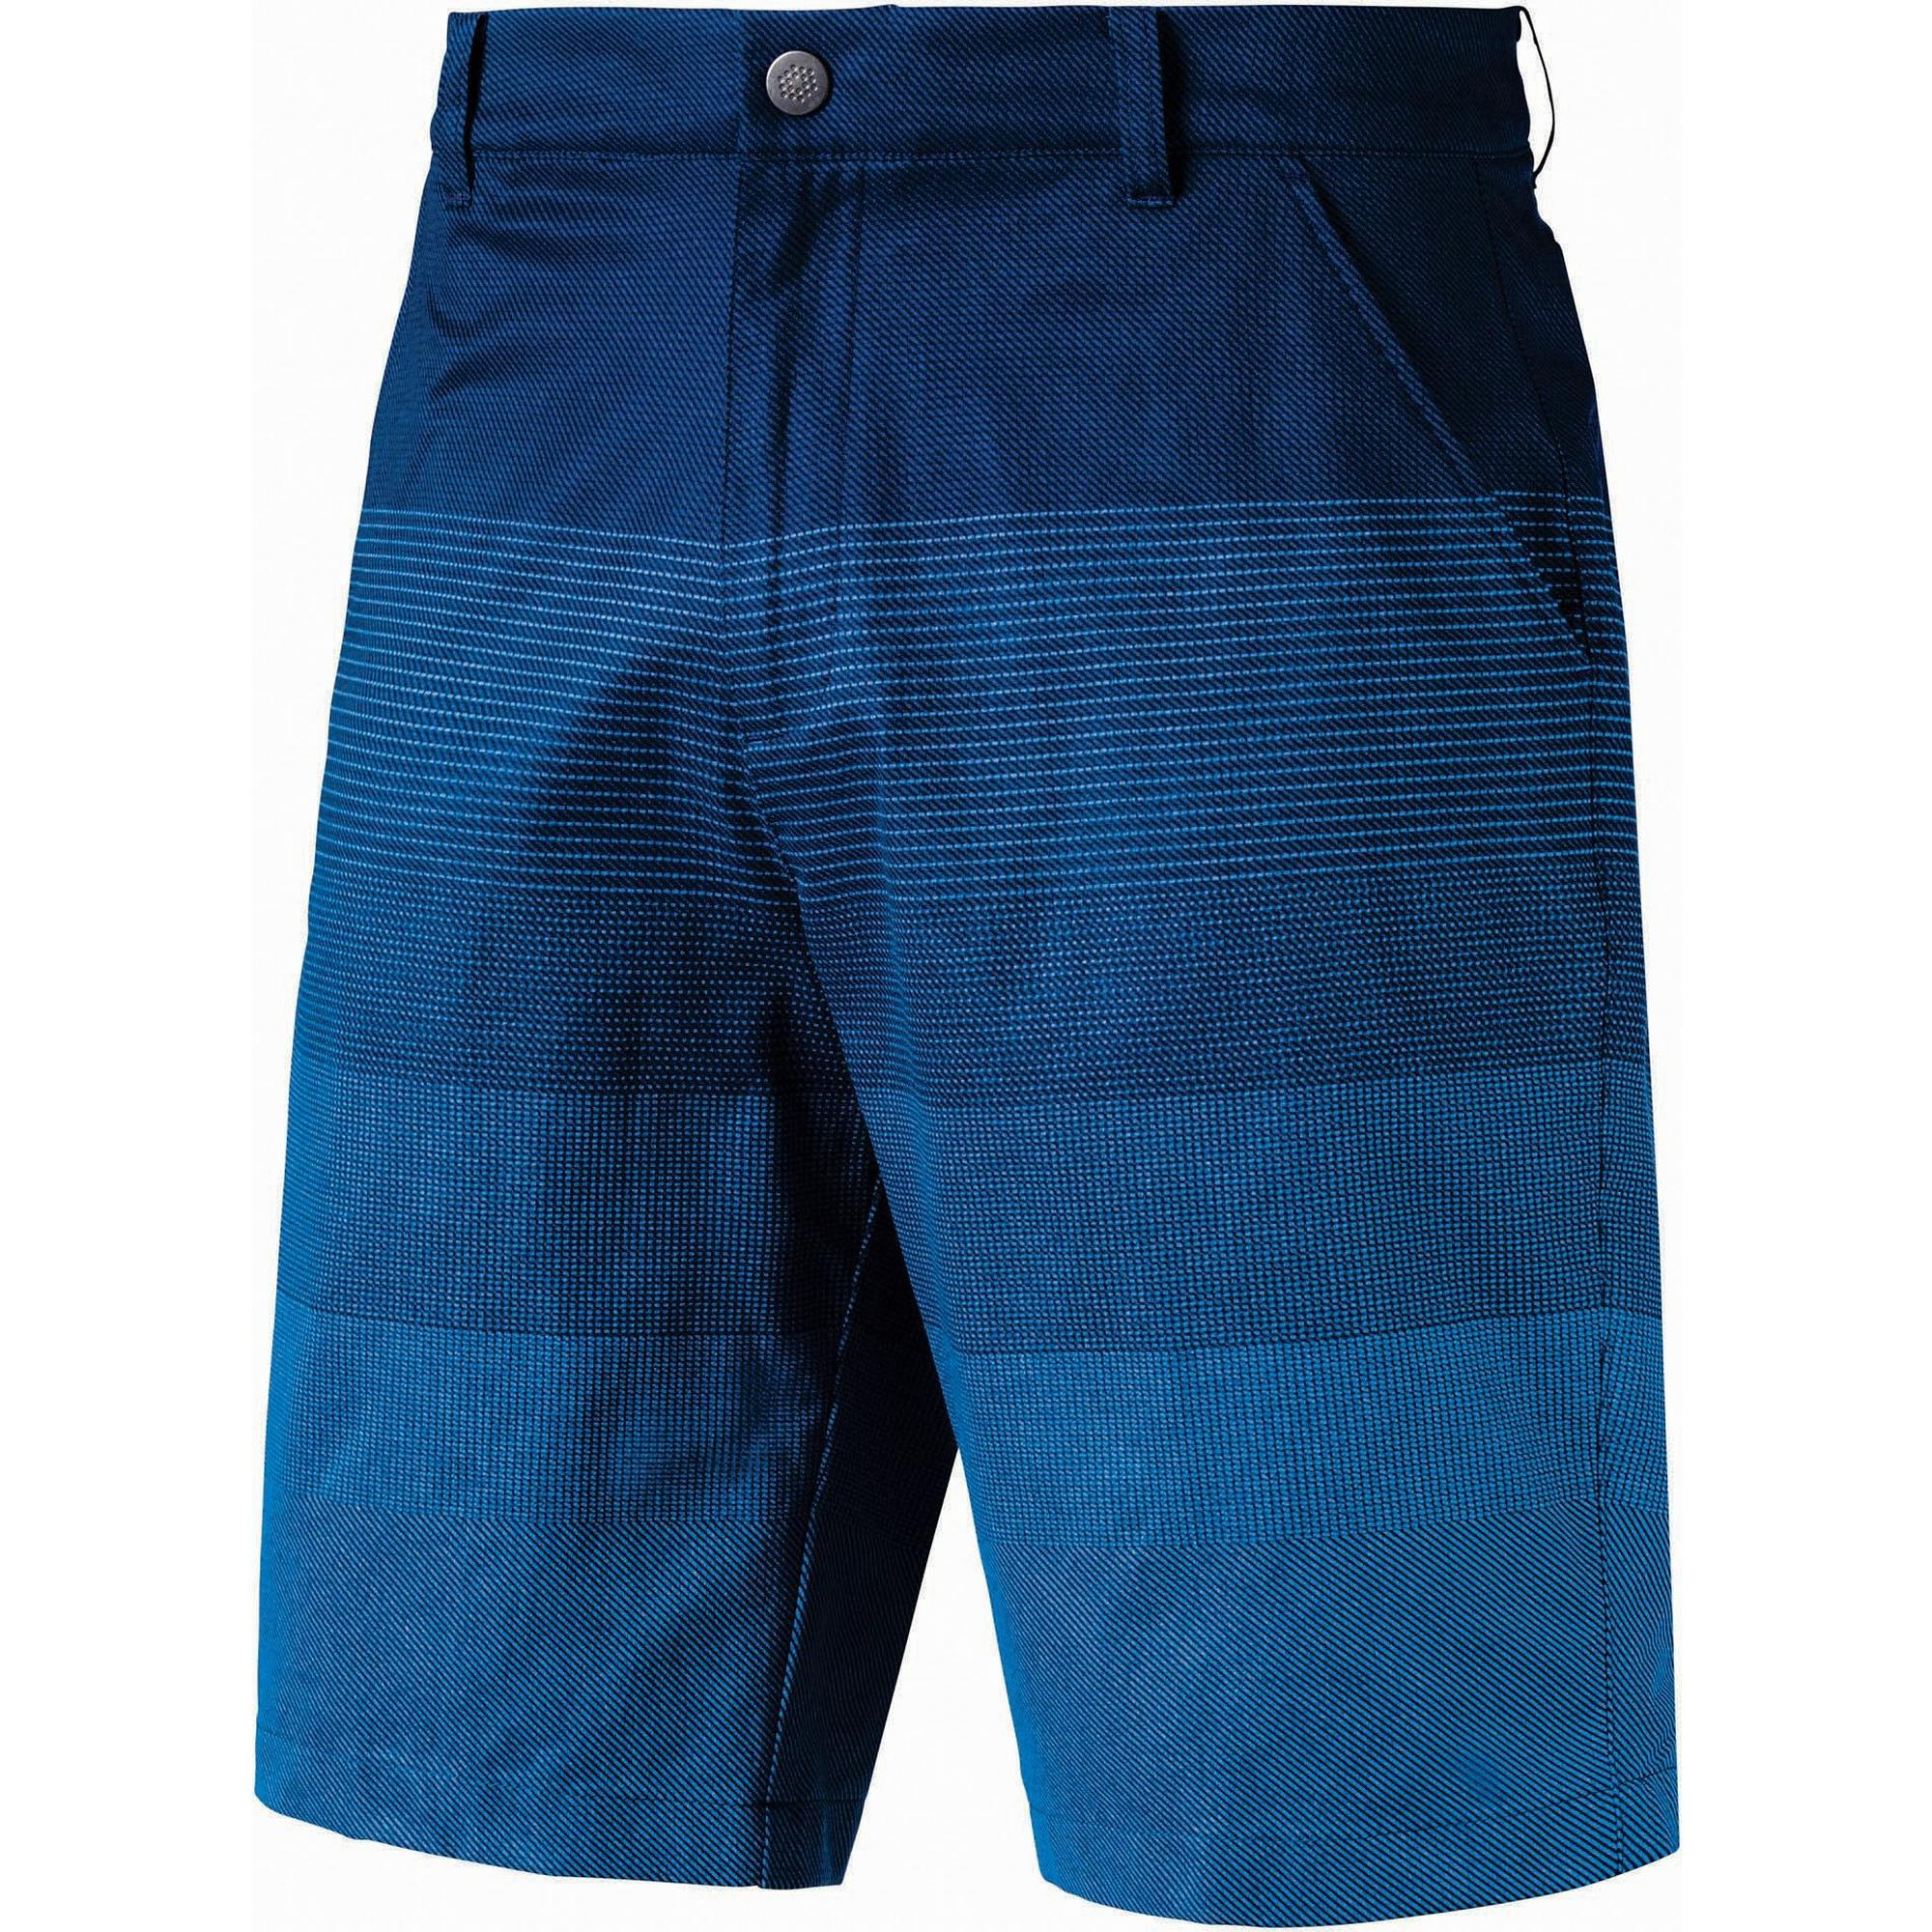 Men's PWRCOOL Mesh Fade Shorts